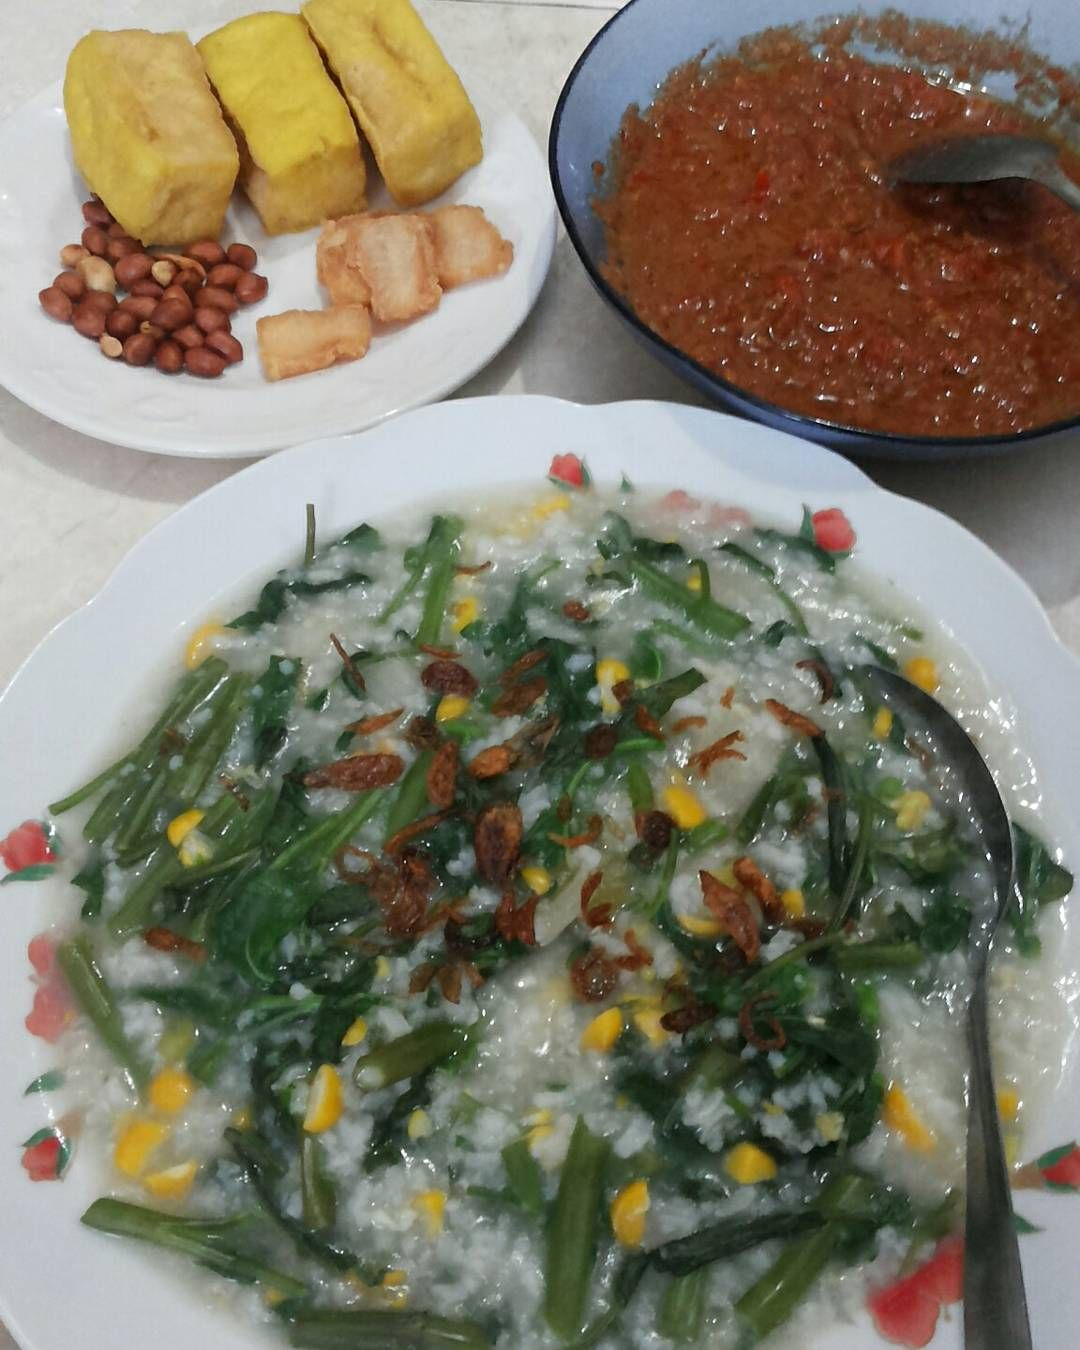 Edisi Kangen Makanan Kampung Trus Masak Sendiri Aja Beginilah Kacang Ayu 250gram By Bali Penampakkan Bubur Manado Dibawah Tumpukkan